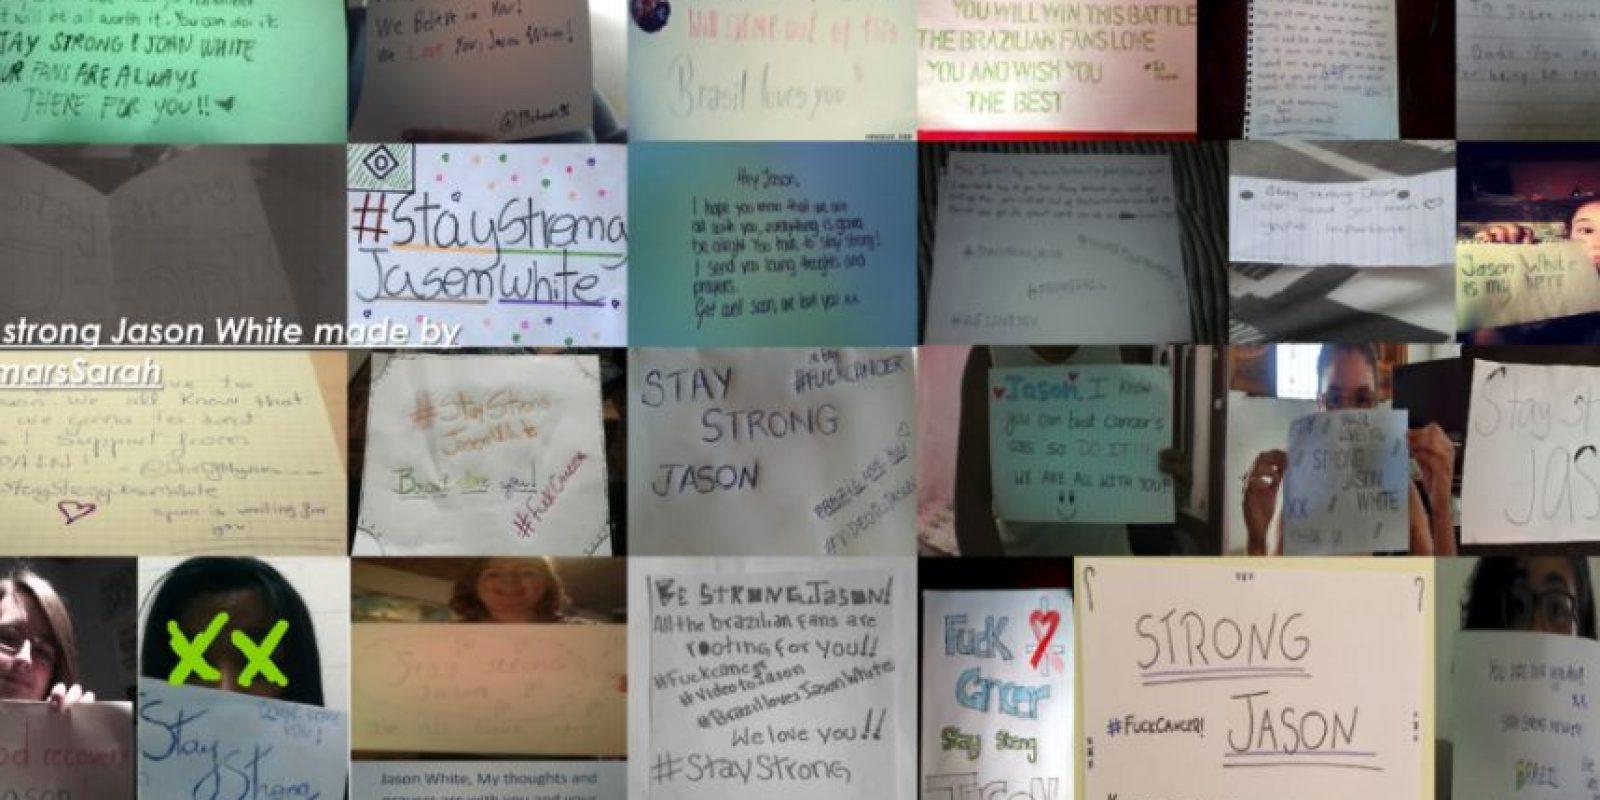 Los fans dedican mensajes de apoyo a Jason White Foto:Tumblr